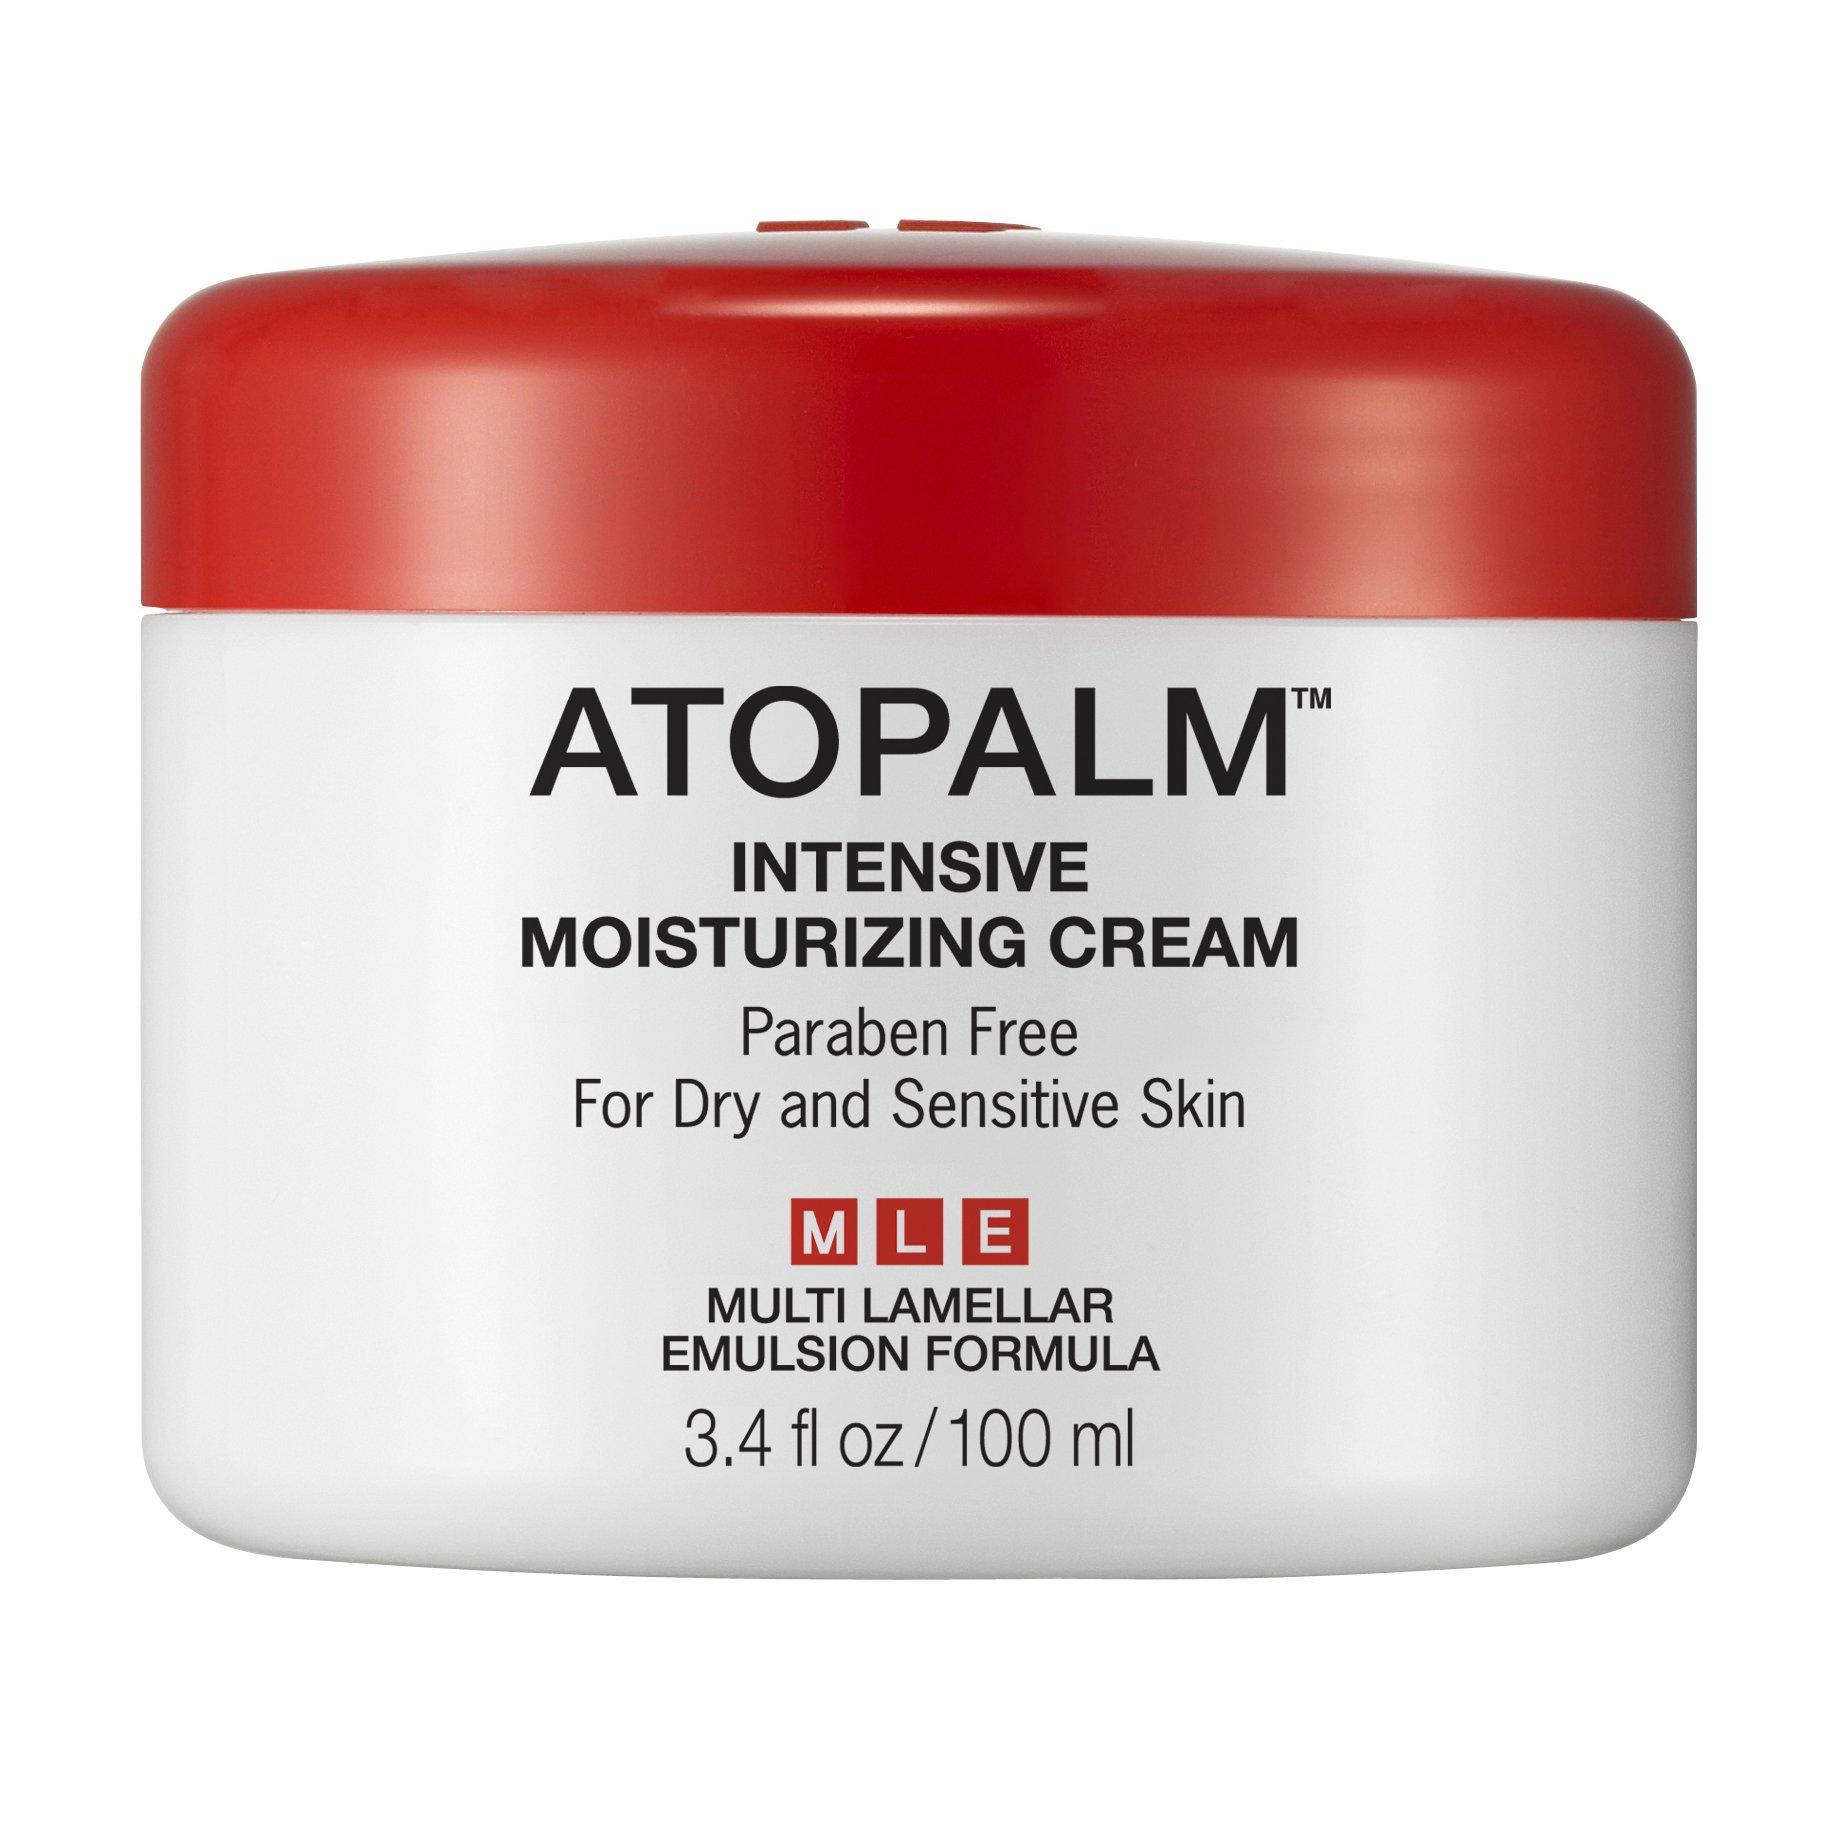 Atopalm Intensive Moisturizing Cream, 3.4 fl. Ounce by Atopalm